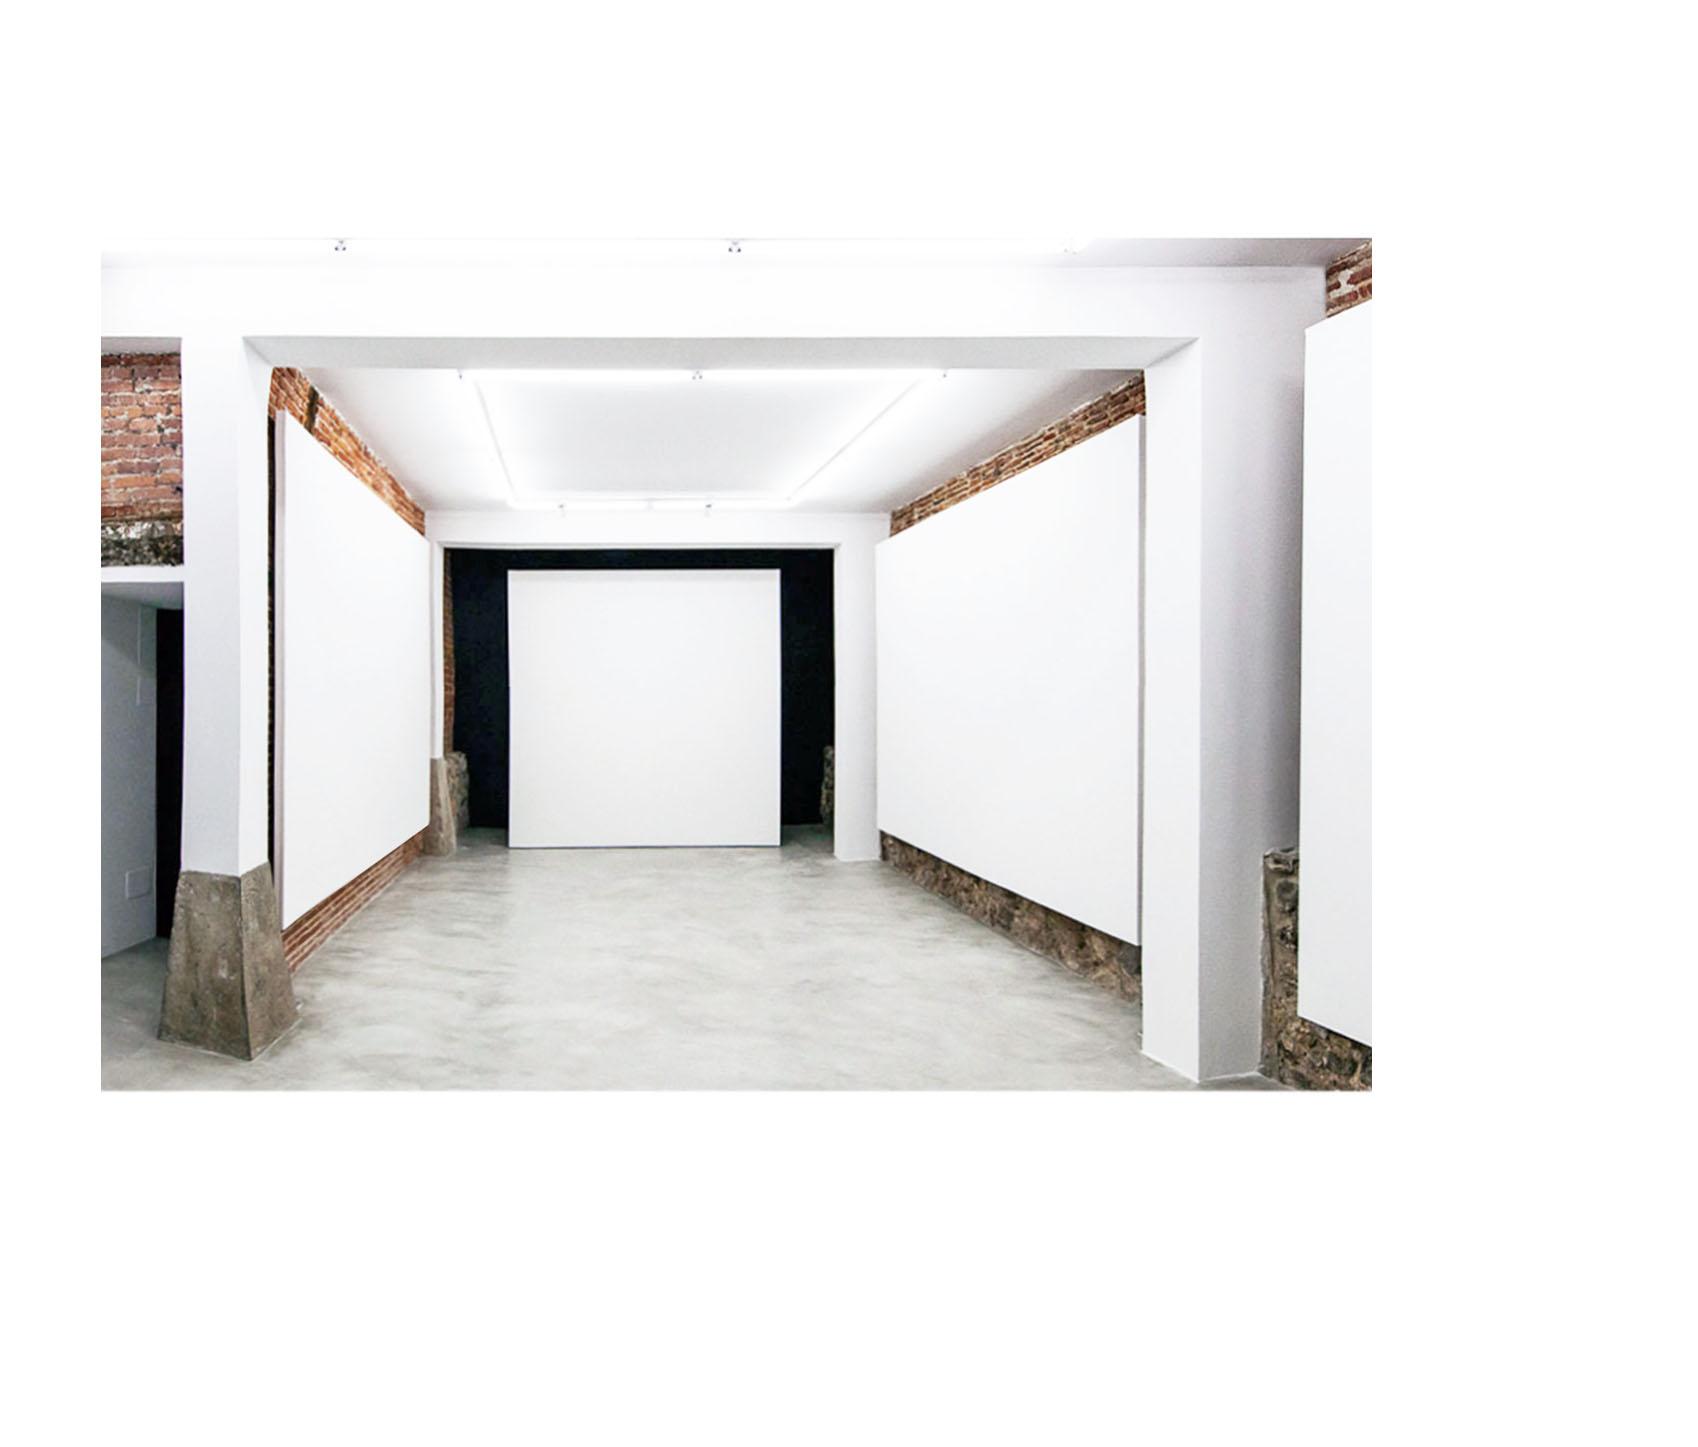 Art Gallery Aldama-Fabré-Bilbao-Image 03.jpg